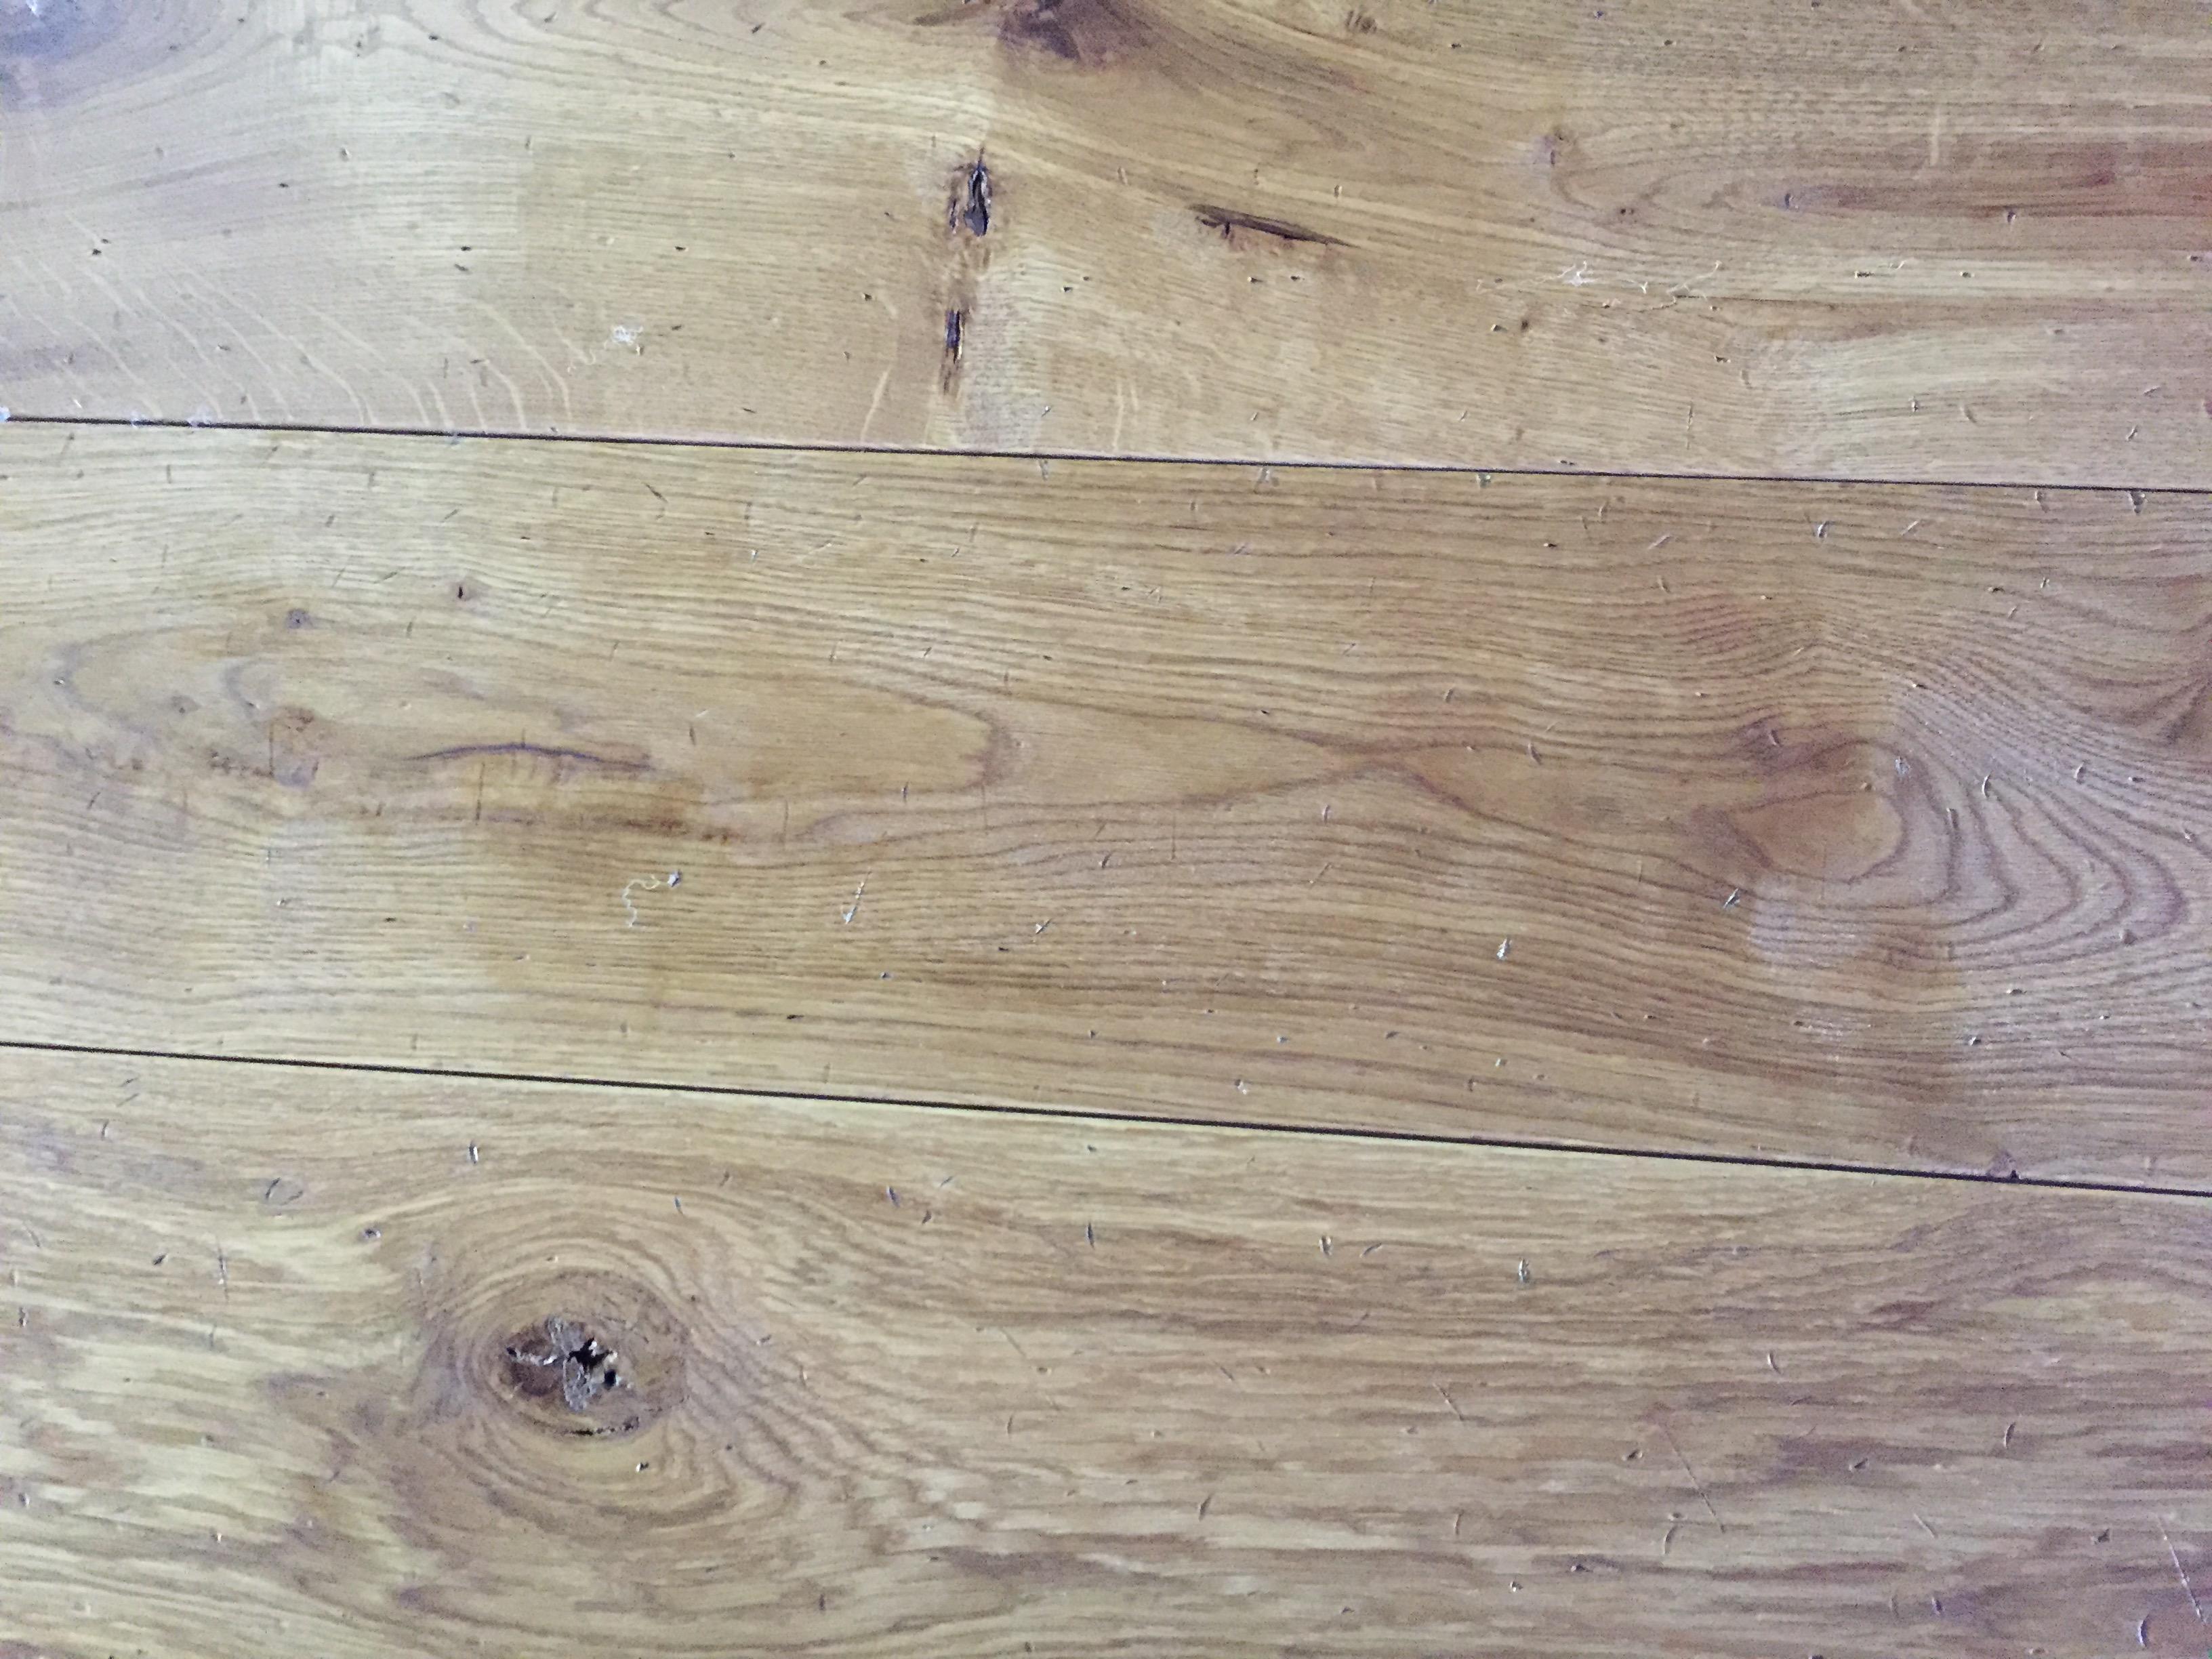 Grenen Vloer Behandelen : Oude houten vloer oude pastorie vloer concrete u2013 oude houten vloer